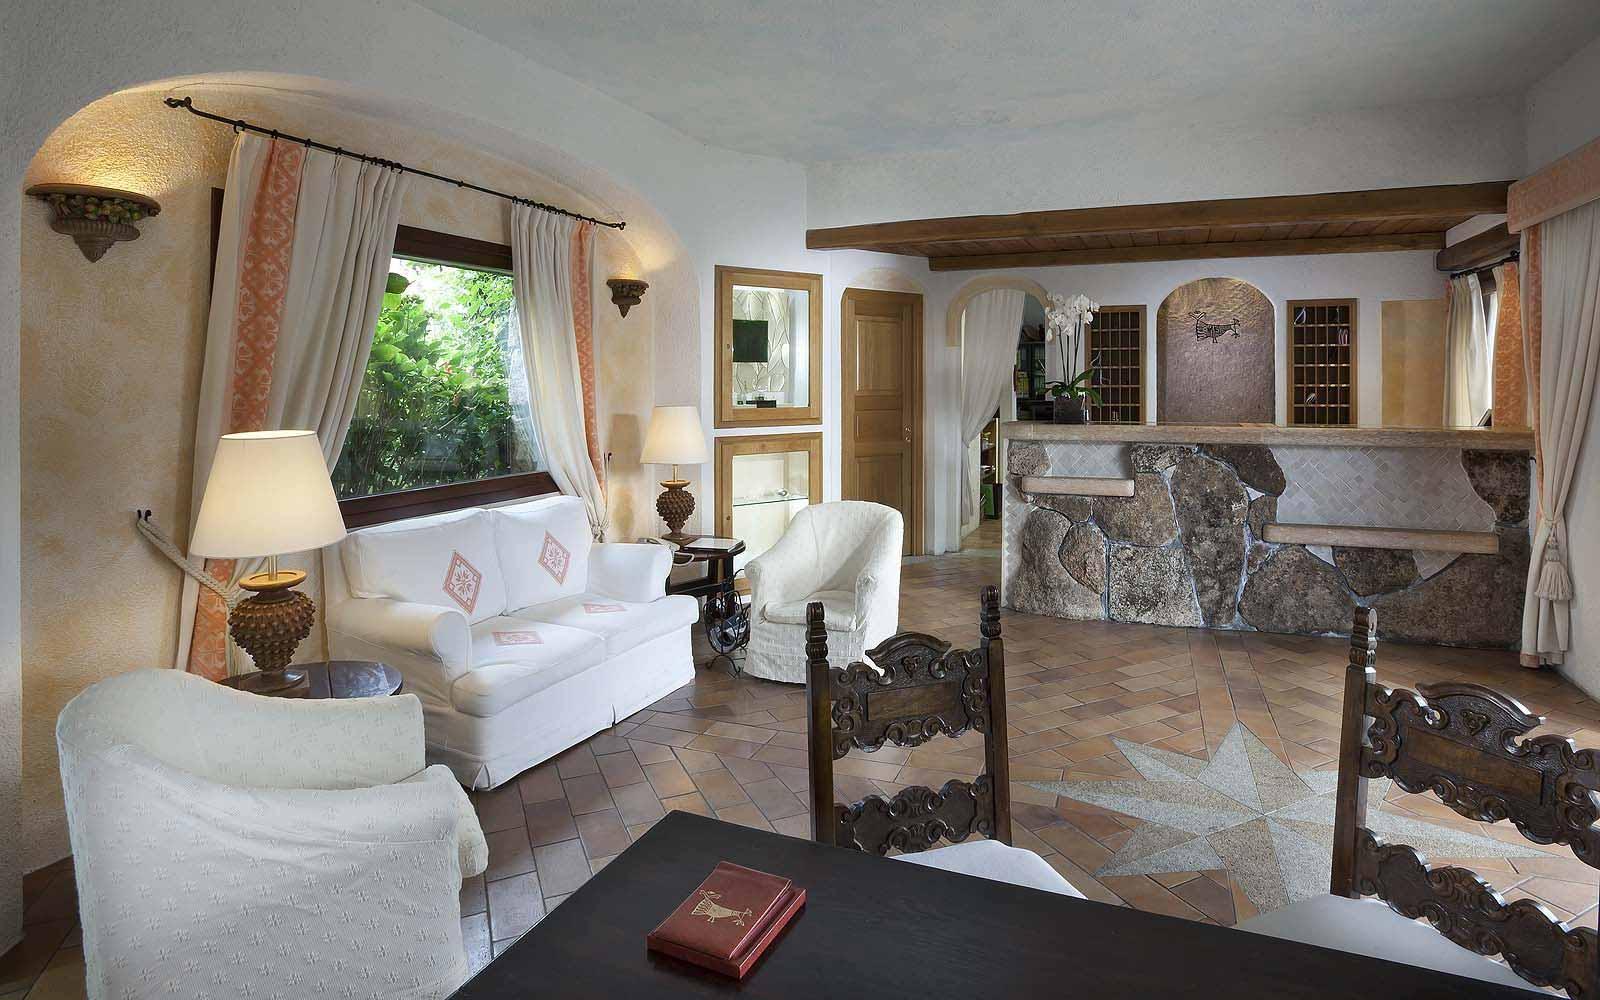 Reception at the Hotel Pitrizza